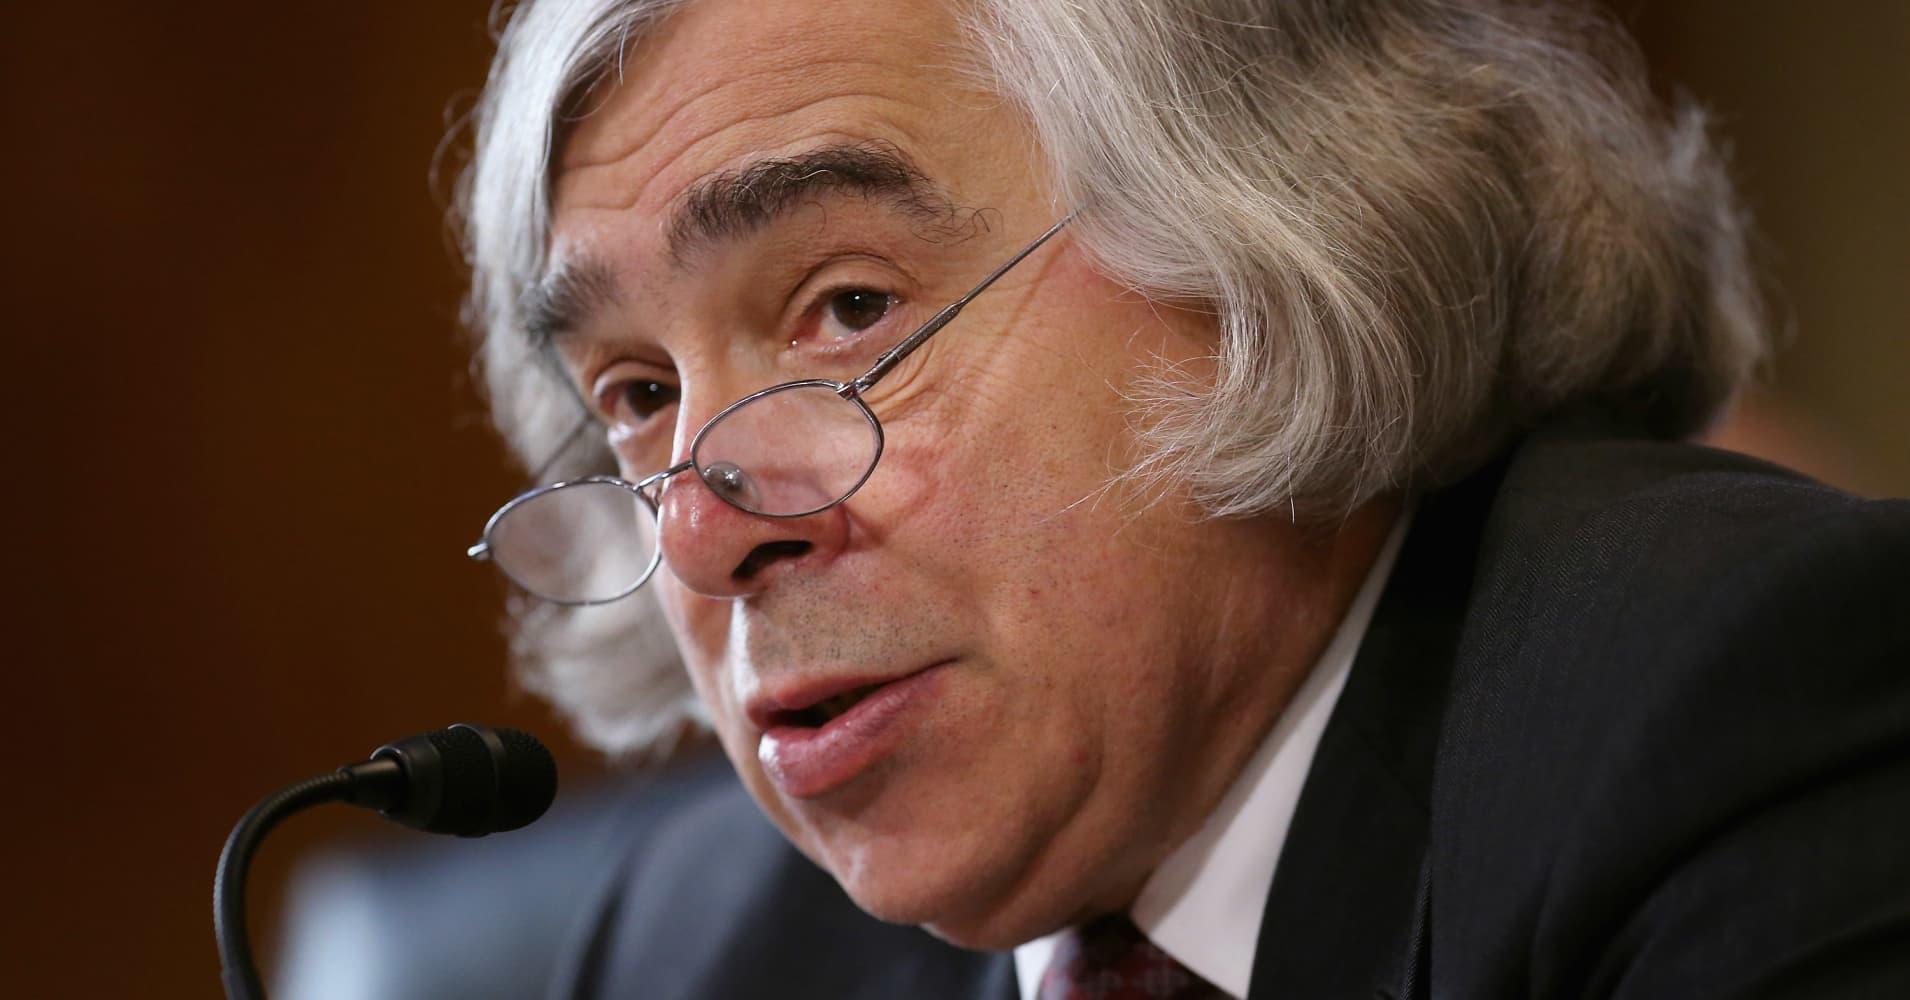 Current nuclear threats on par with Cuban missile crisis, former US Energy secretary says